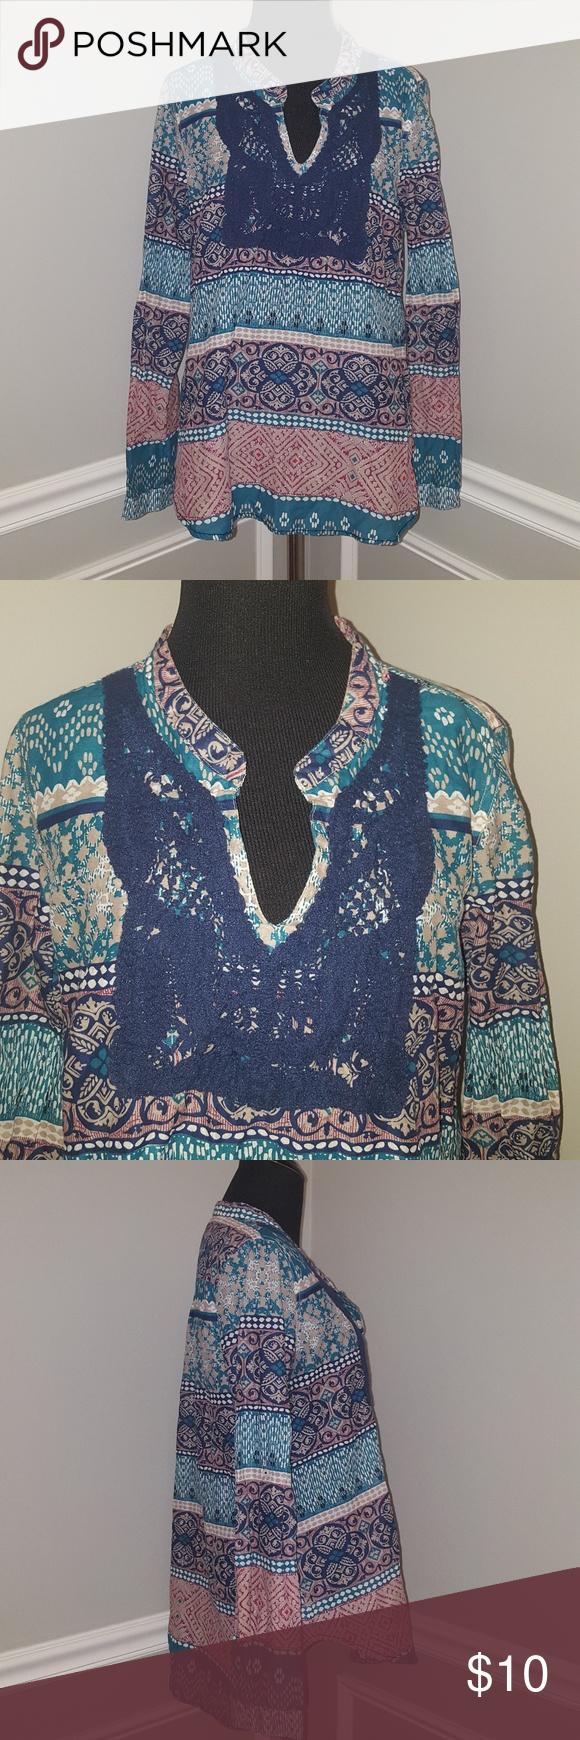 Emily Van Den Bergh Multicolor Crochet Tunic Top Emily Van Den Bergh Multicolor Crochet Tunic Top Size Xl Good Use Crochet Tunic Tops Crochet Tunic Tunic Tops